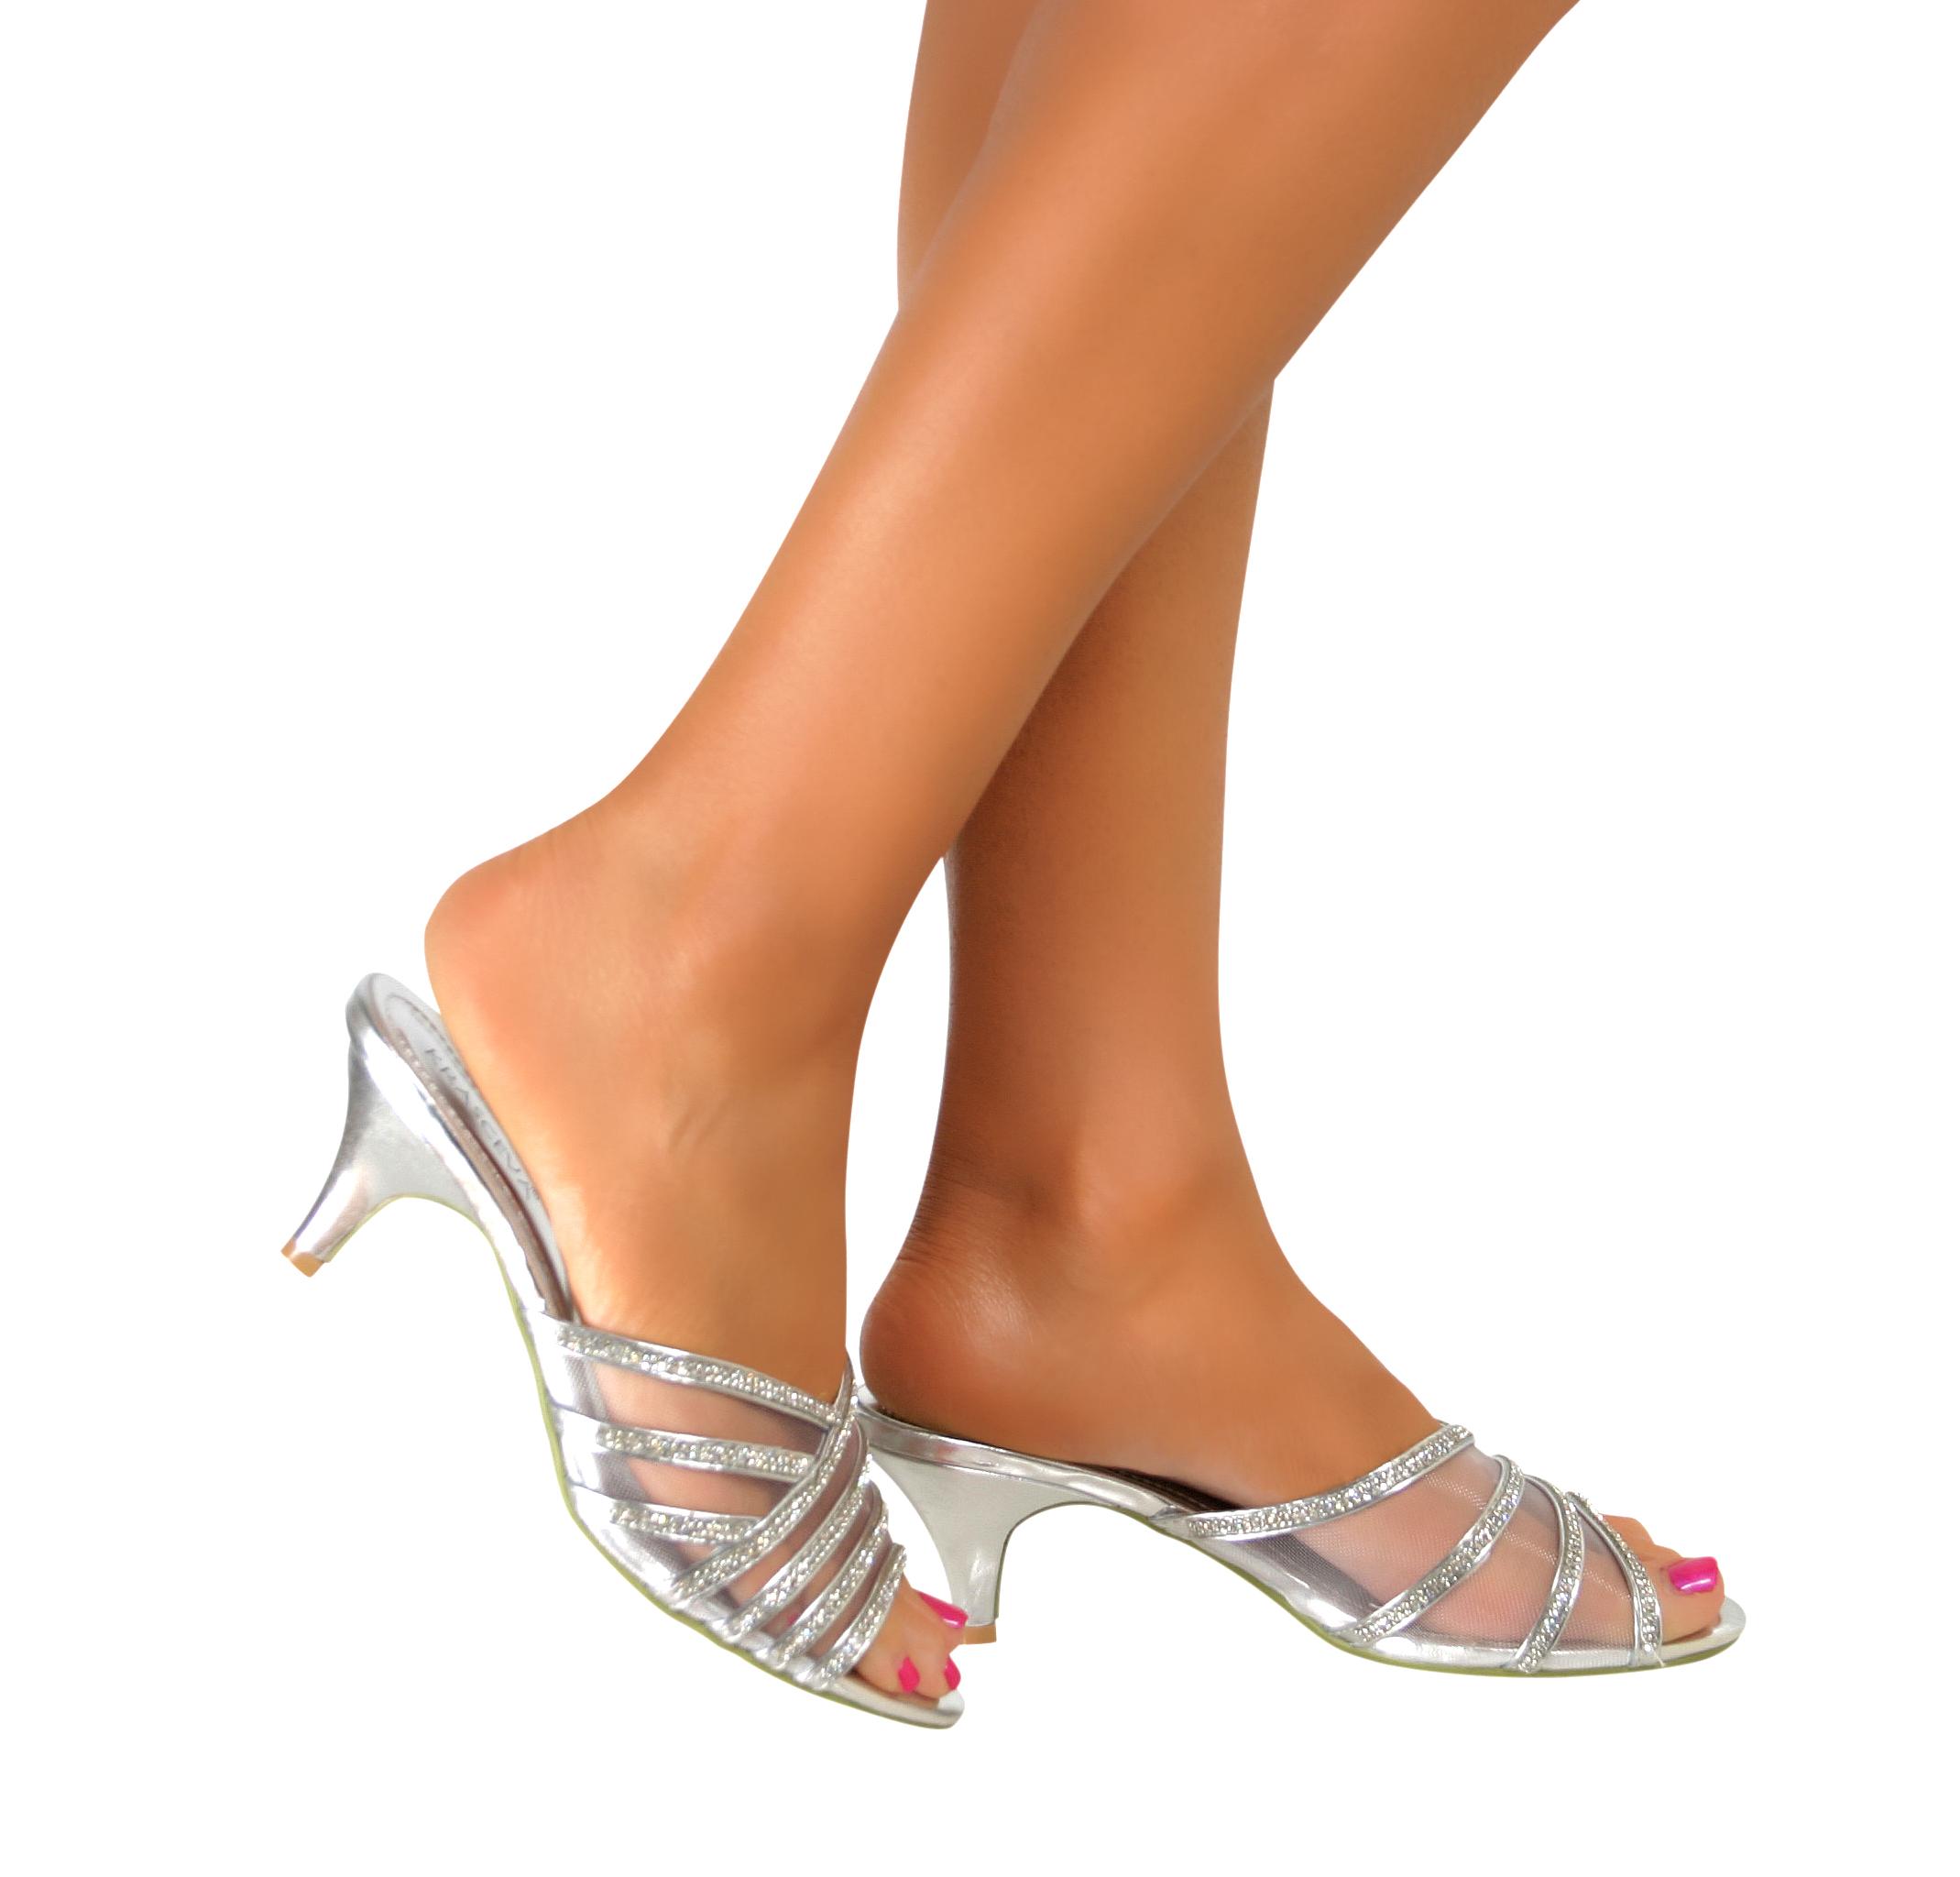 femmes nuptial bas talon moyen sandales strass enfiler t chaussures mules ebay. Black Bedroom Furniture Sets. Home Design Ideas